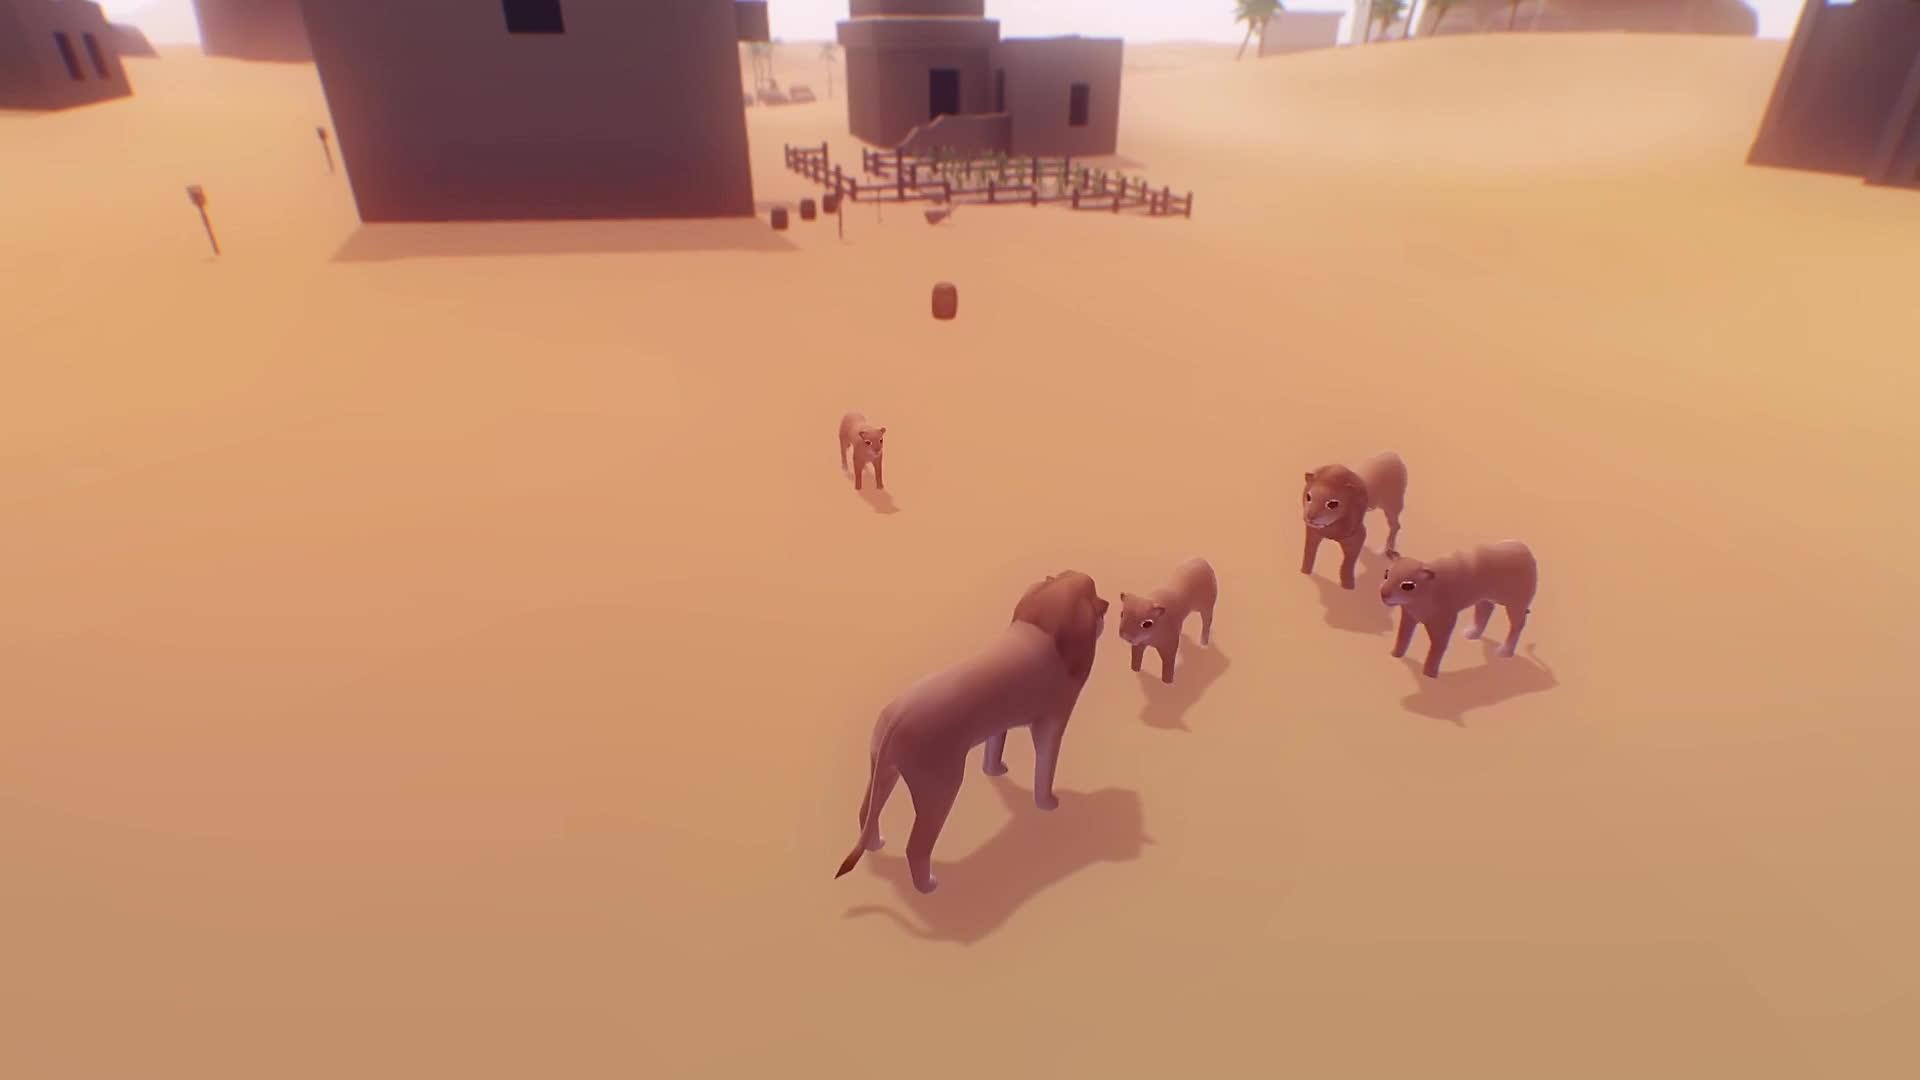 alan watts, david oreilly, gaming, EVERYTHING - Gameplay Trailer | PS4 GIFs